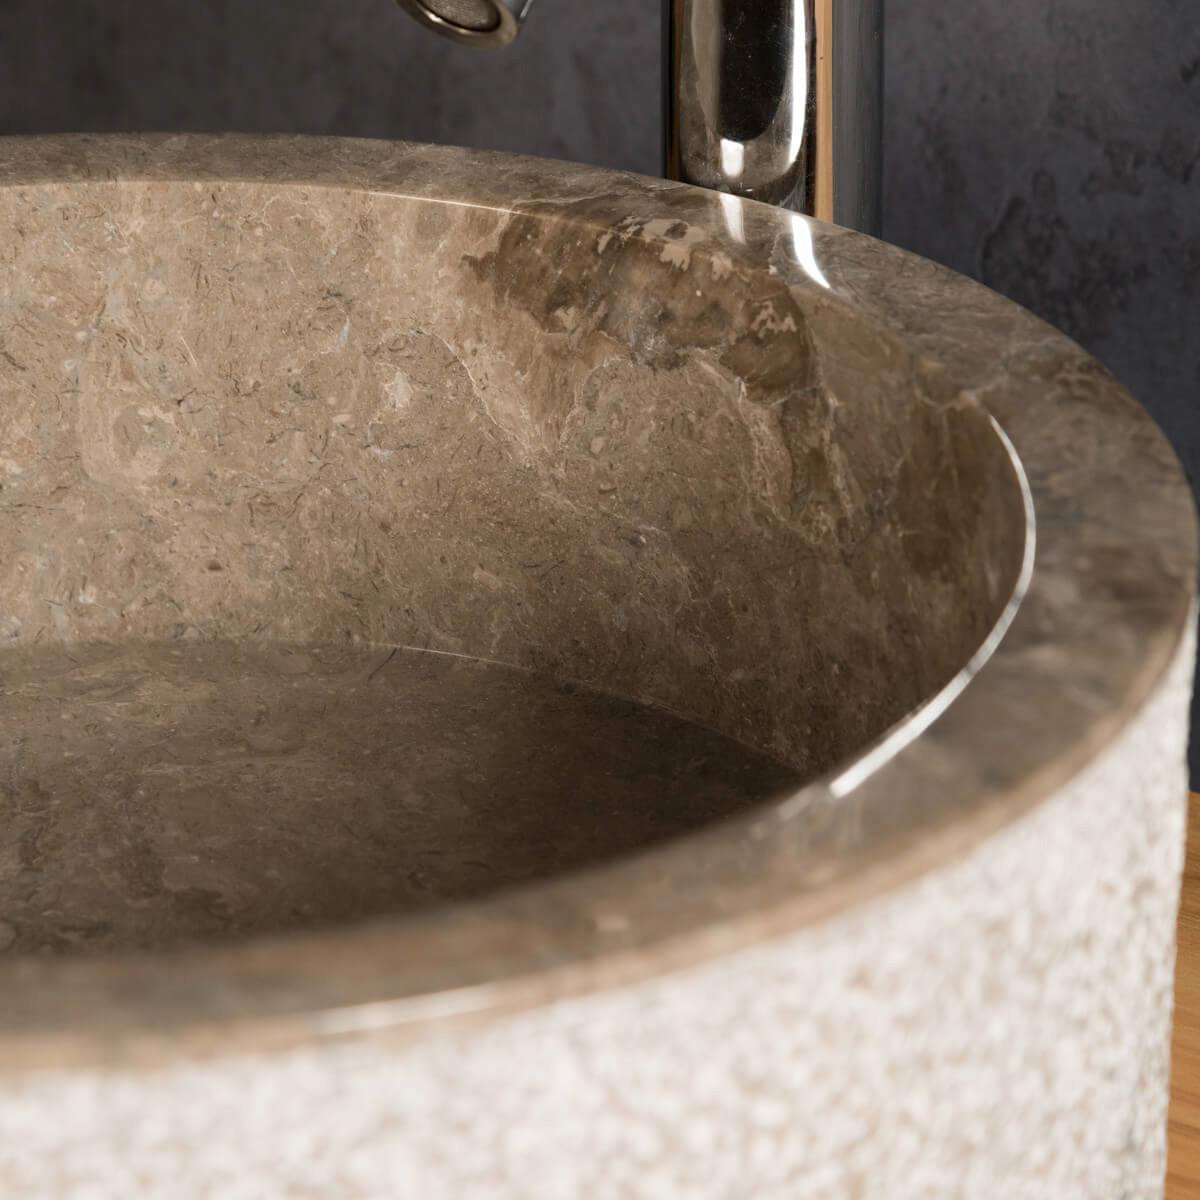 vasque salle de bain en marbre elbe gris taupe 40cm. Black Bedroom Furniture Sets. Home Design Ideas